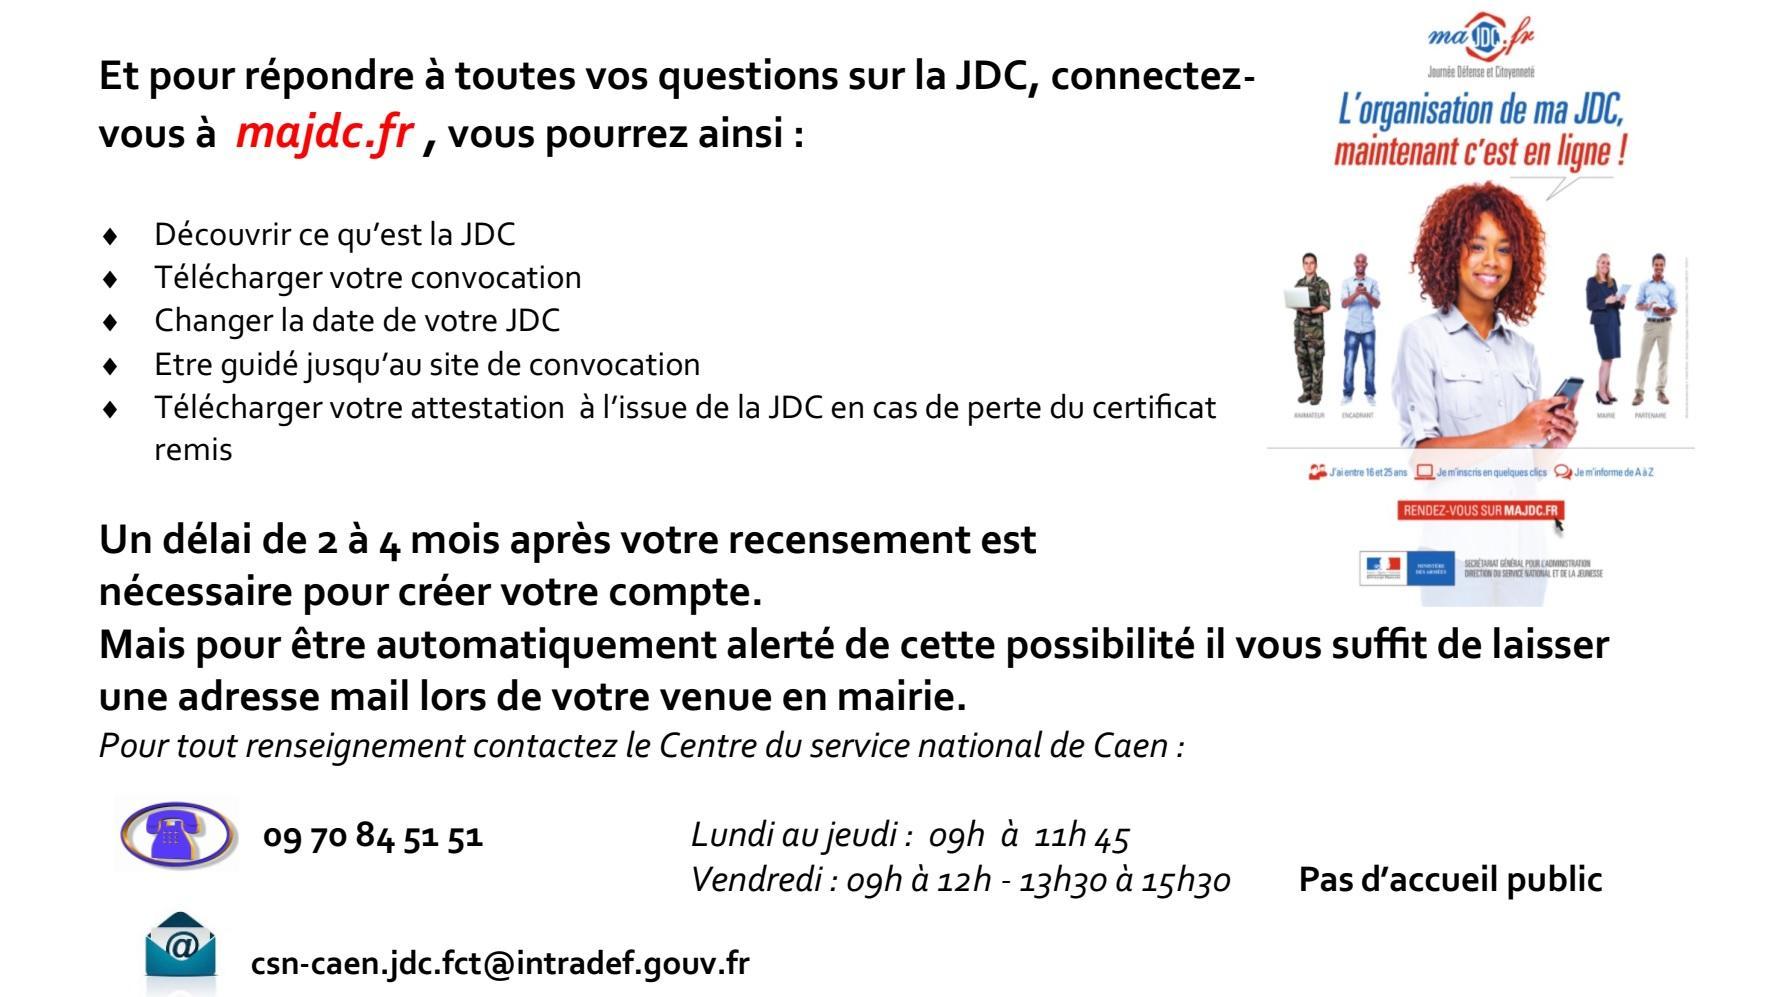 20200911 np caen info parcours citoyennete image2